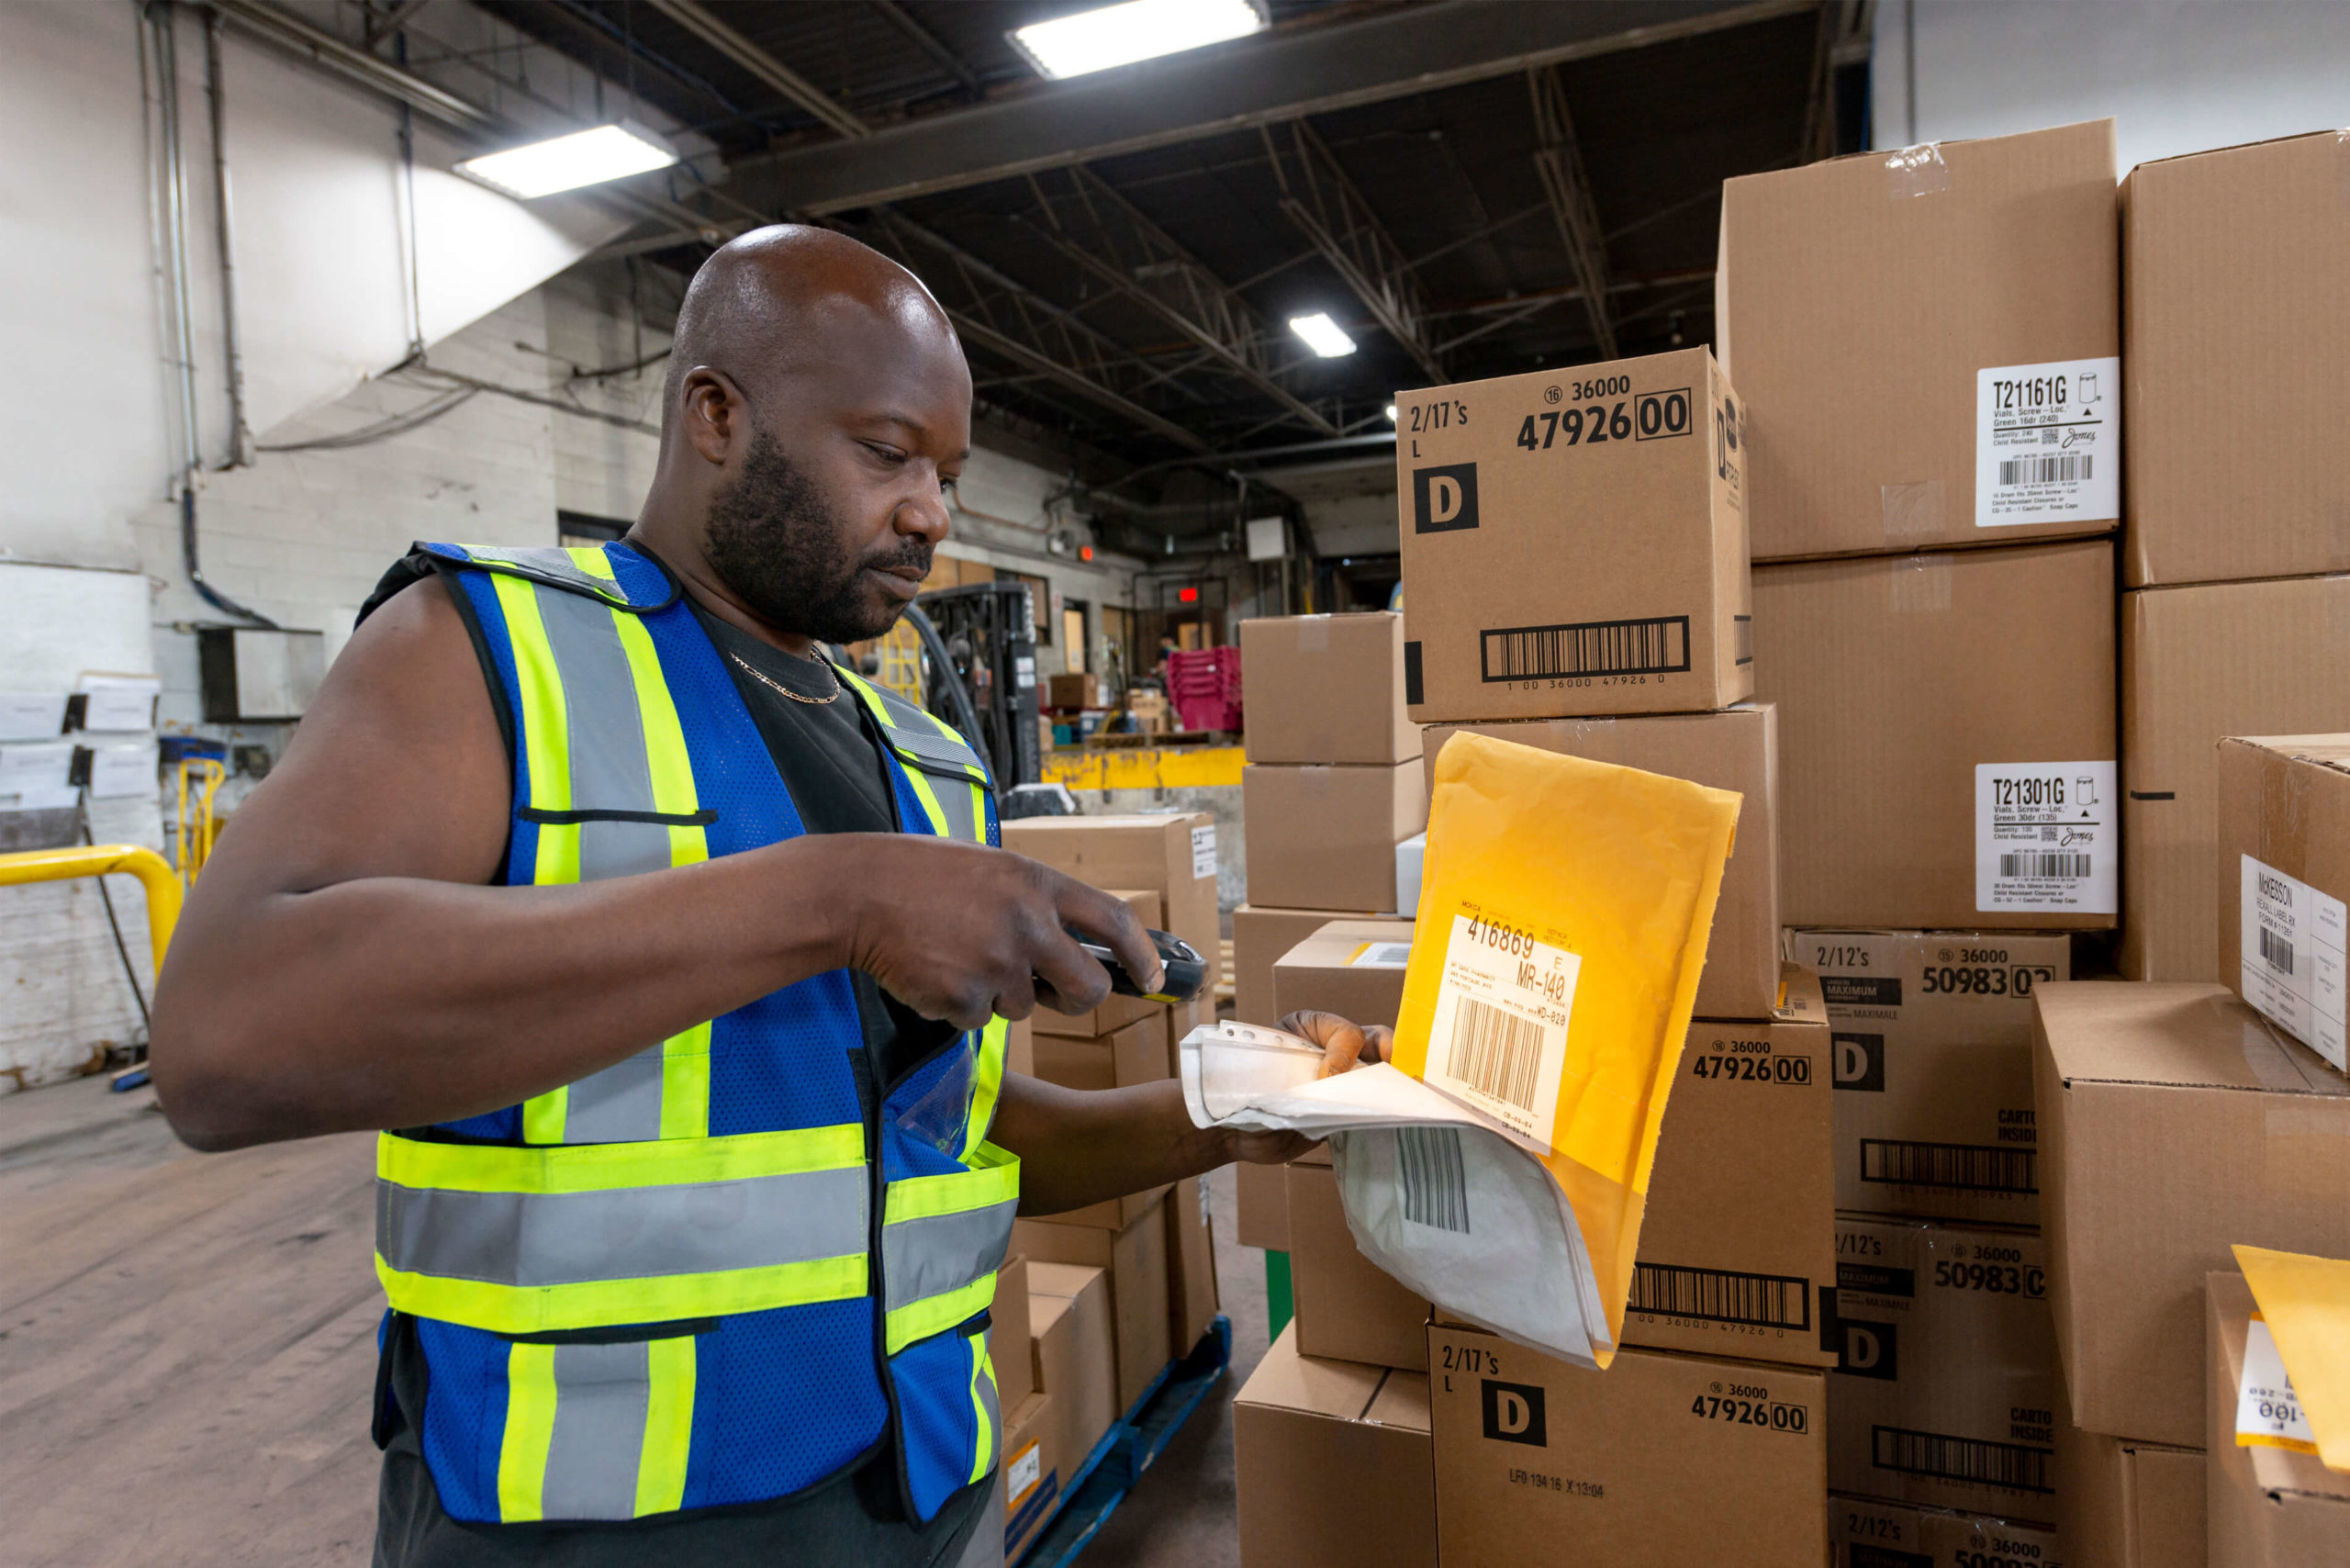 Parcel Shipment Scanning by the Gradewine's Worker